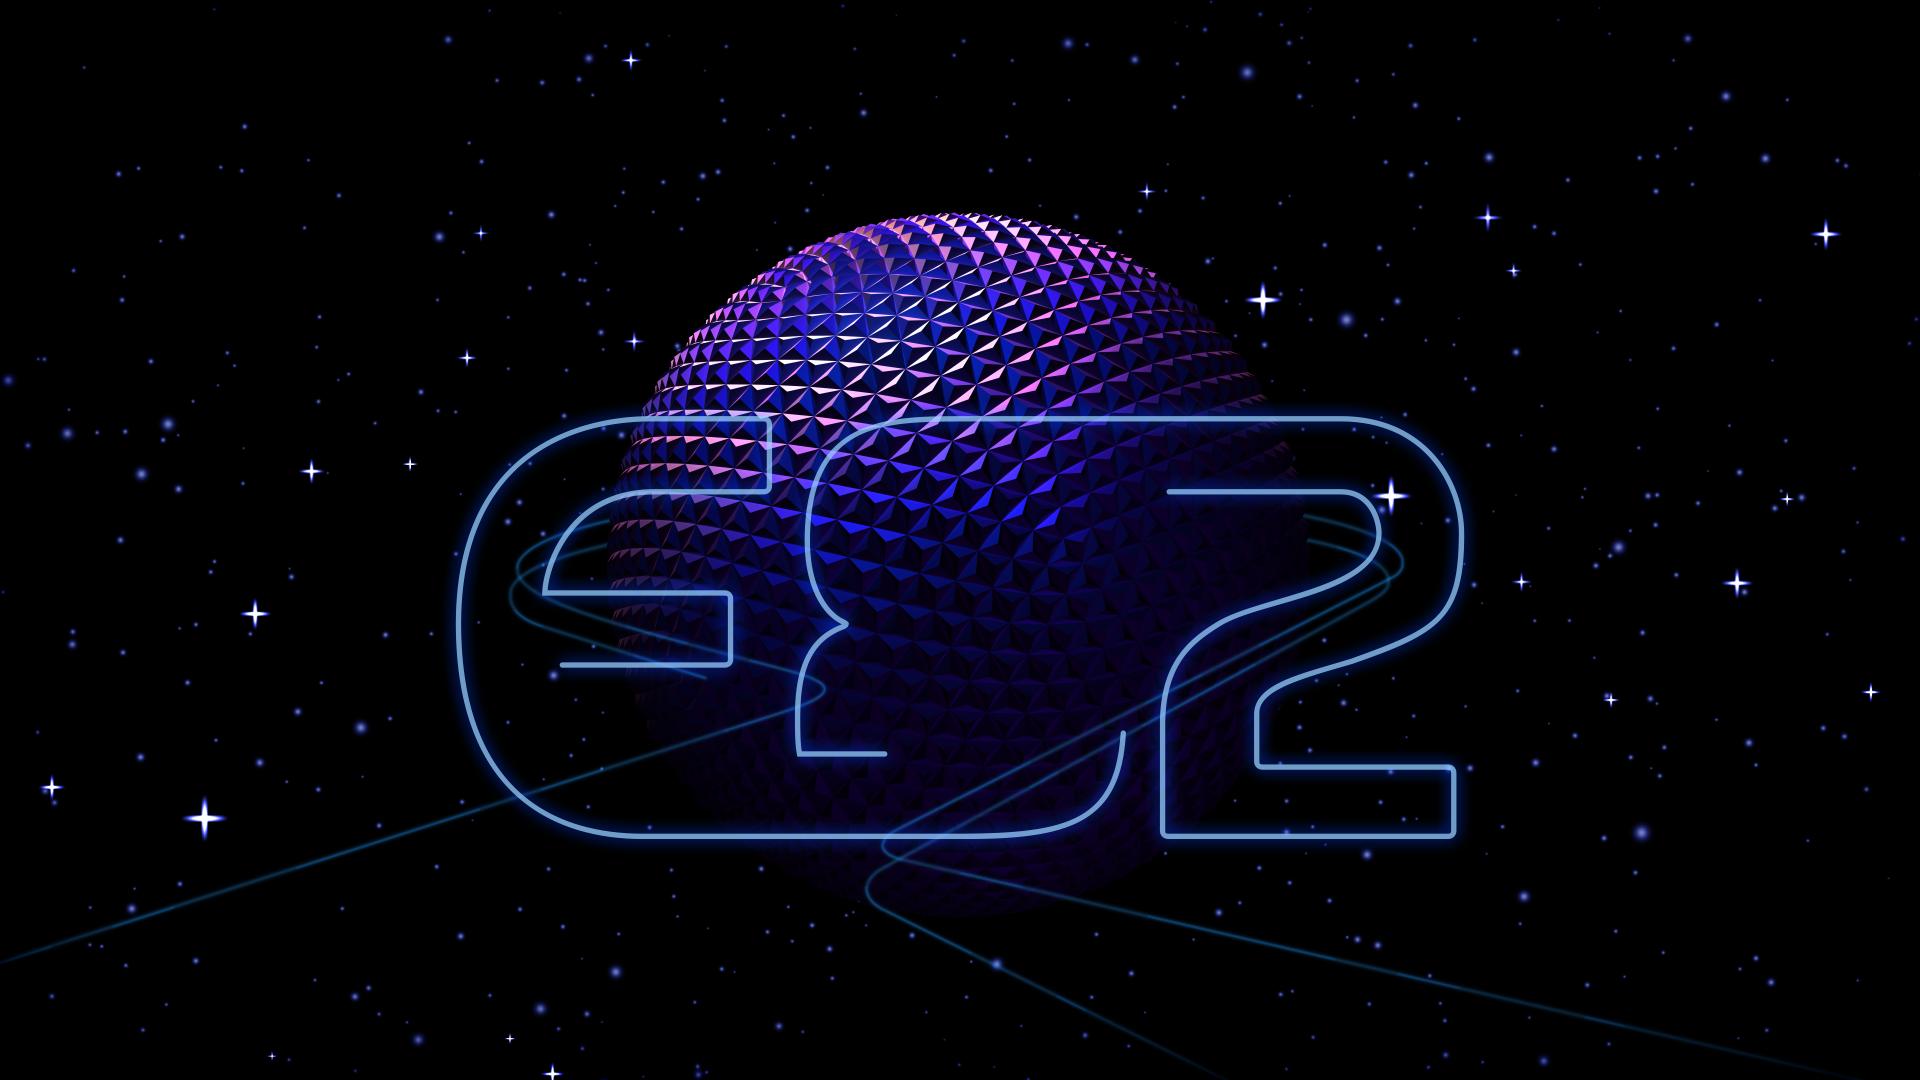 E82FilmsFrame8.png